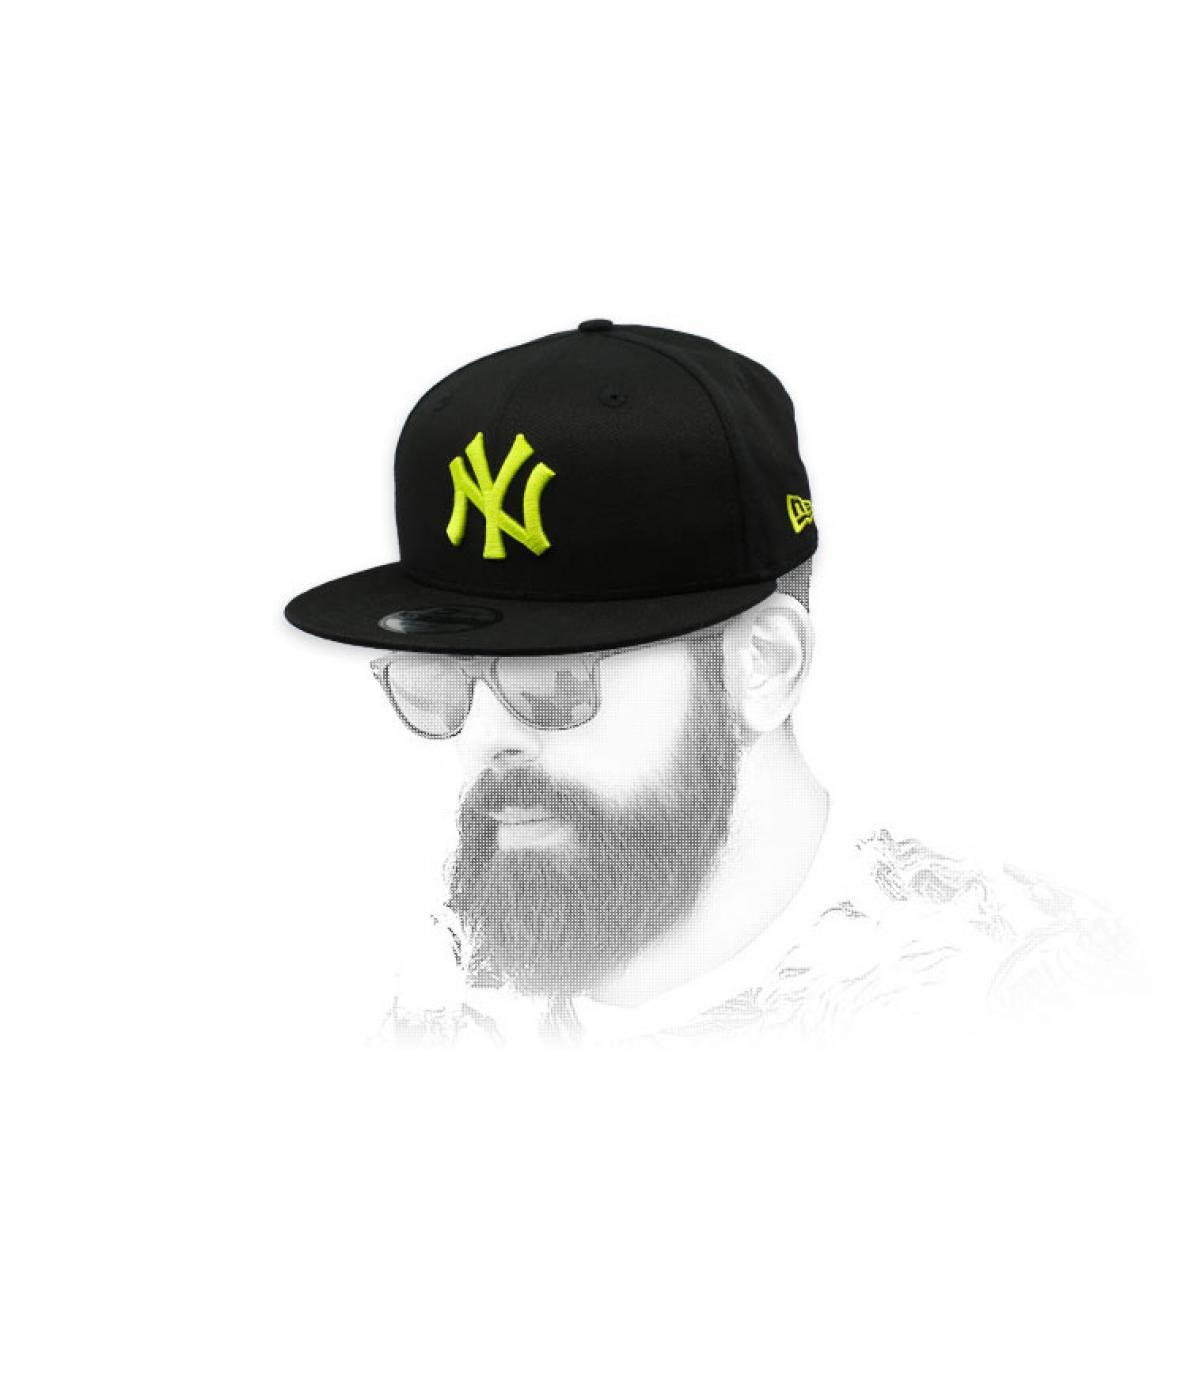 Snapback NY schwarz gelb